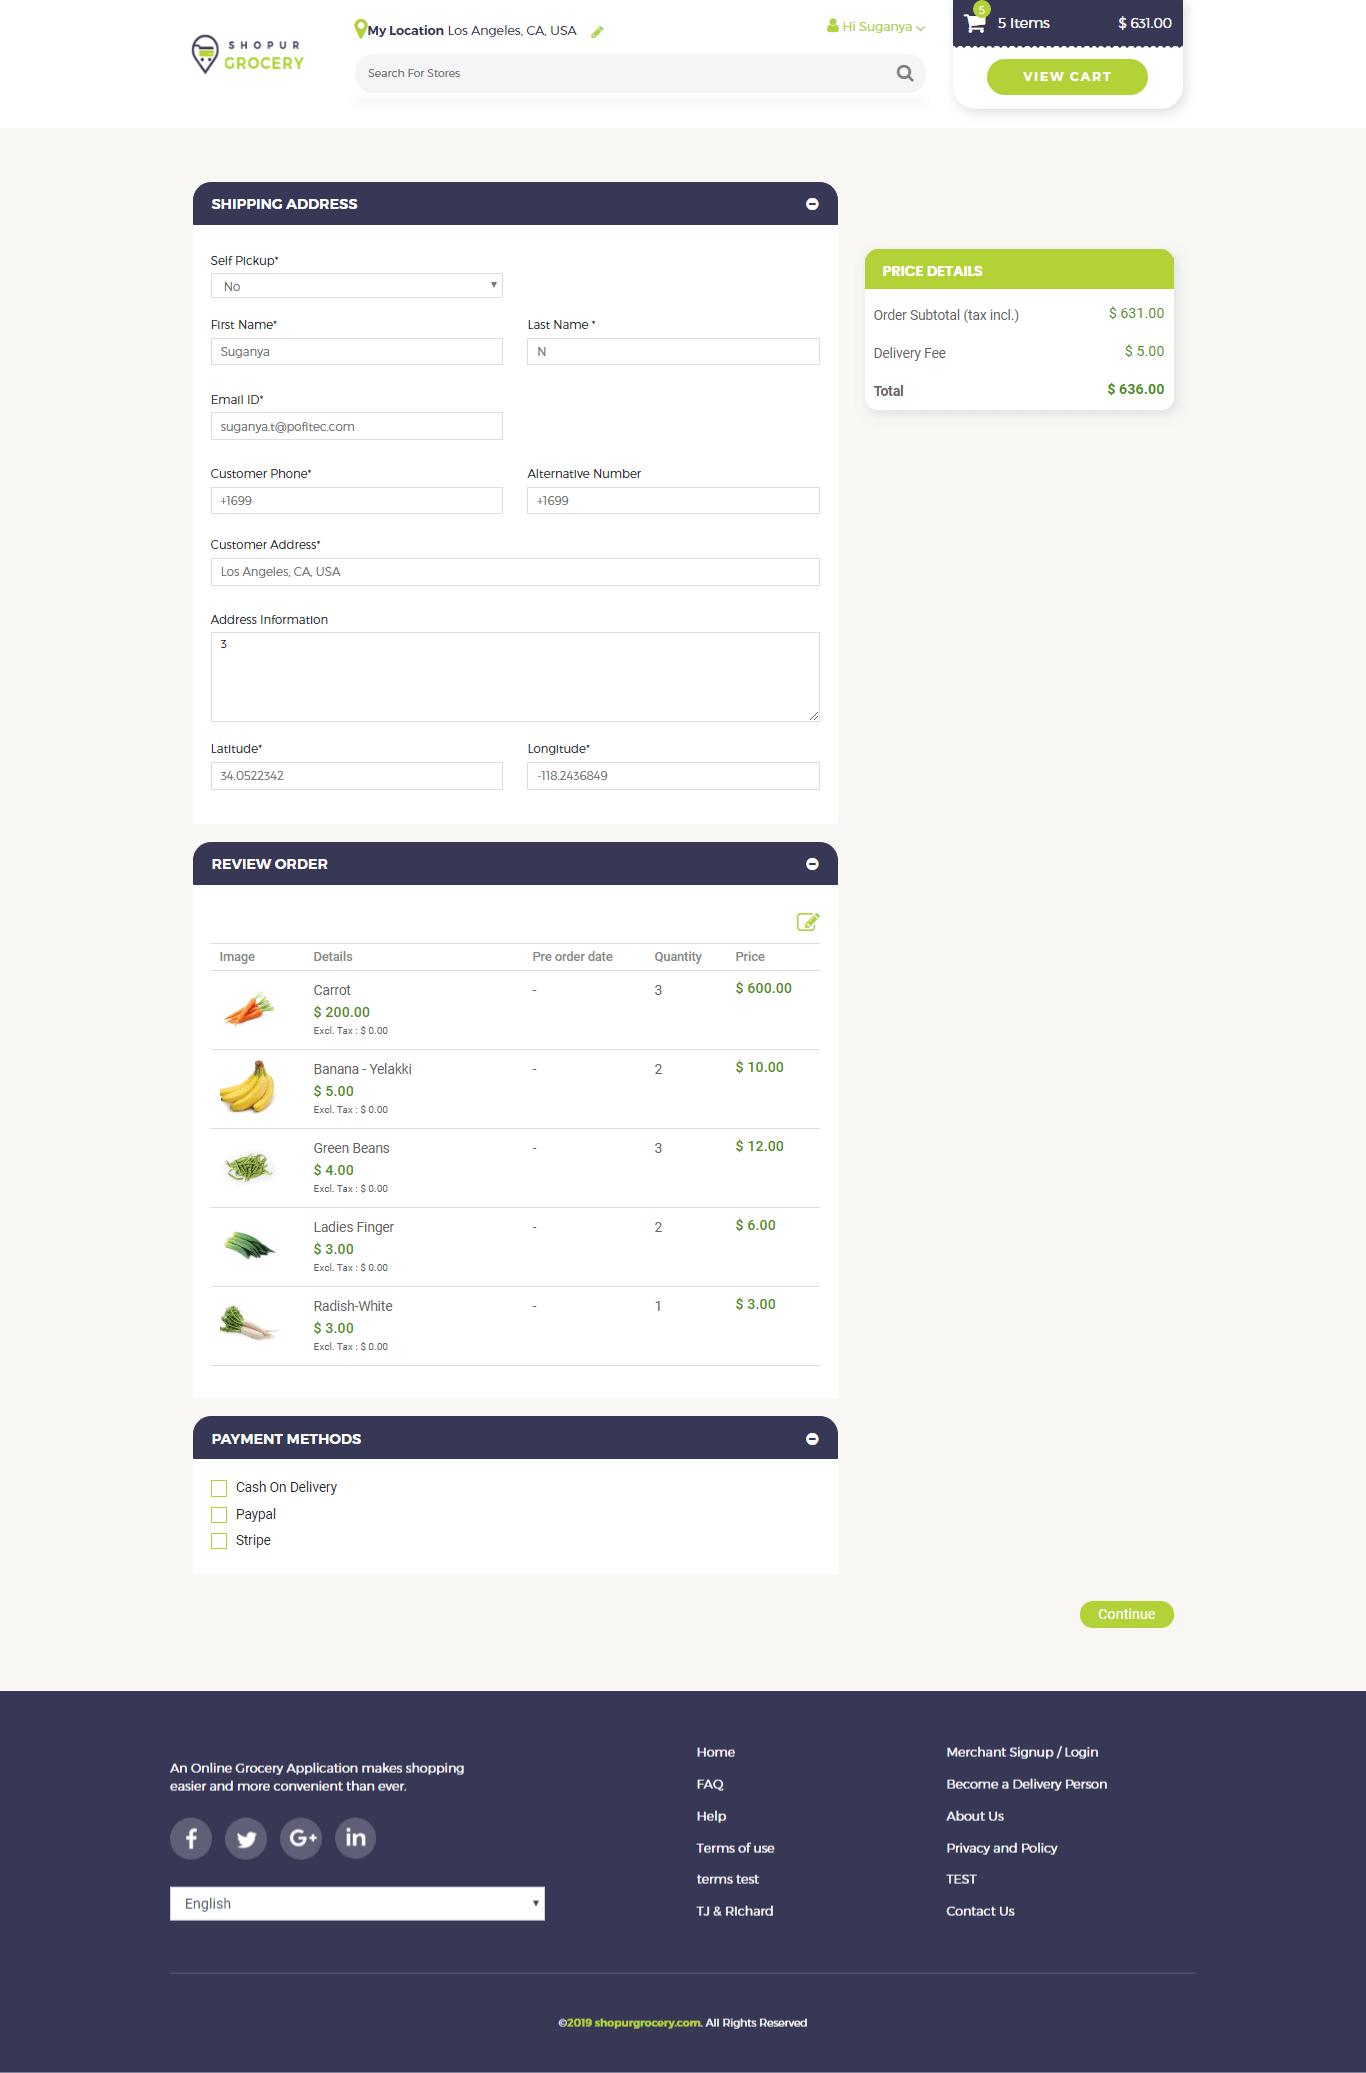 ShopurGrocery updating shipping address